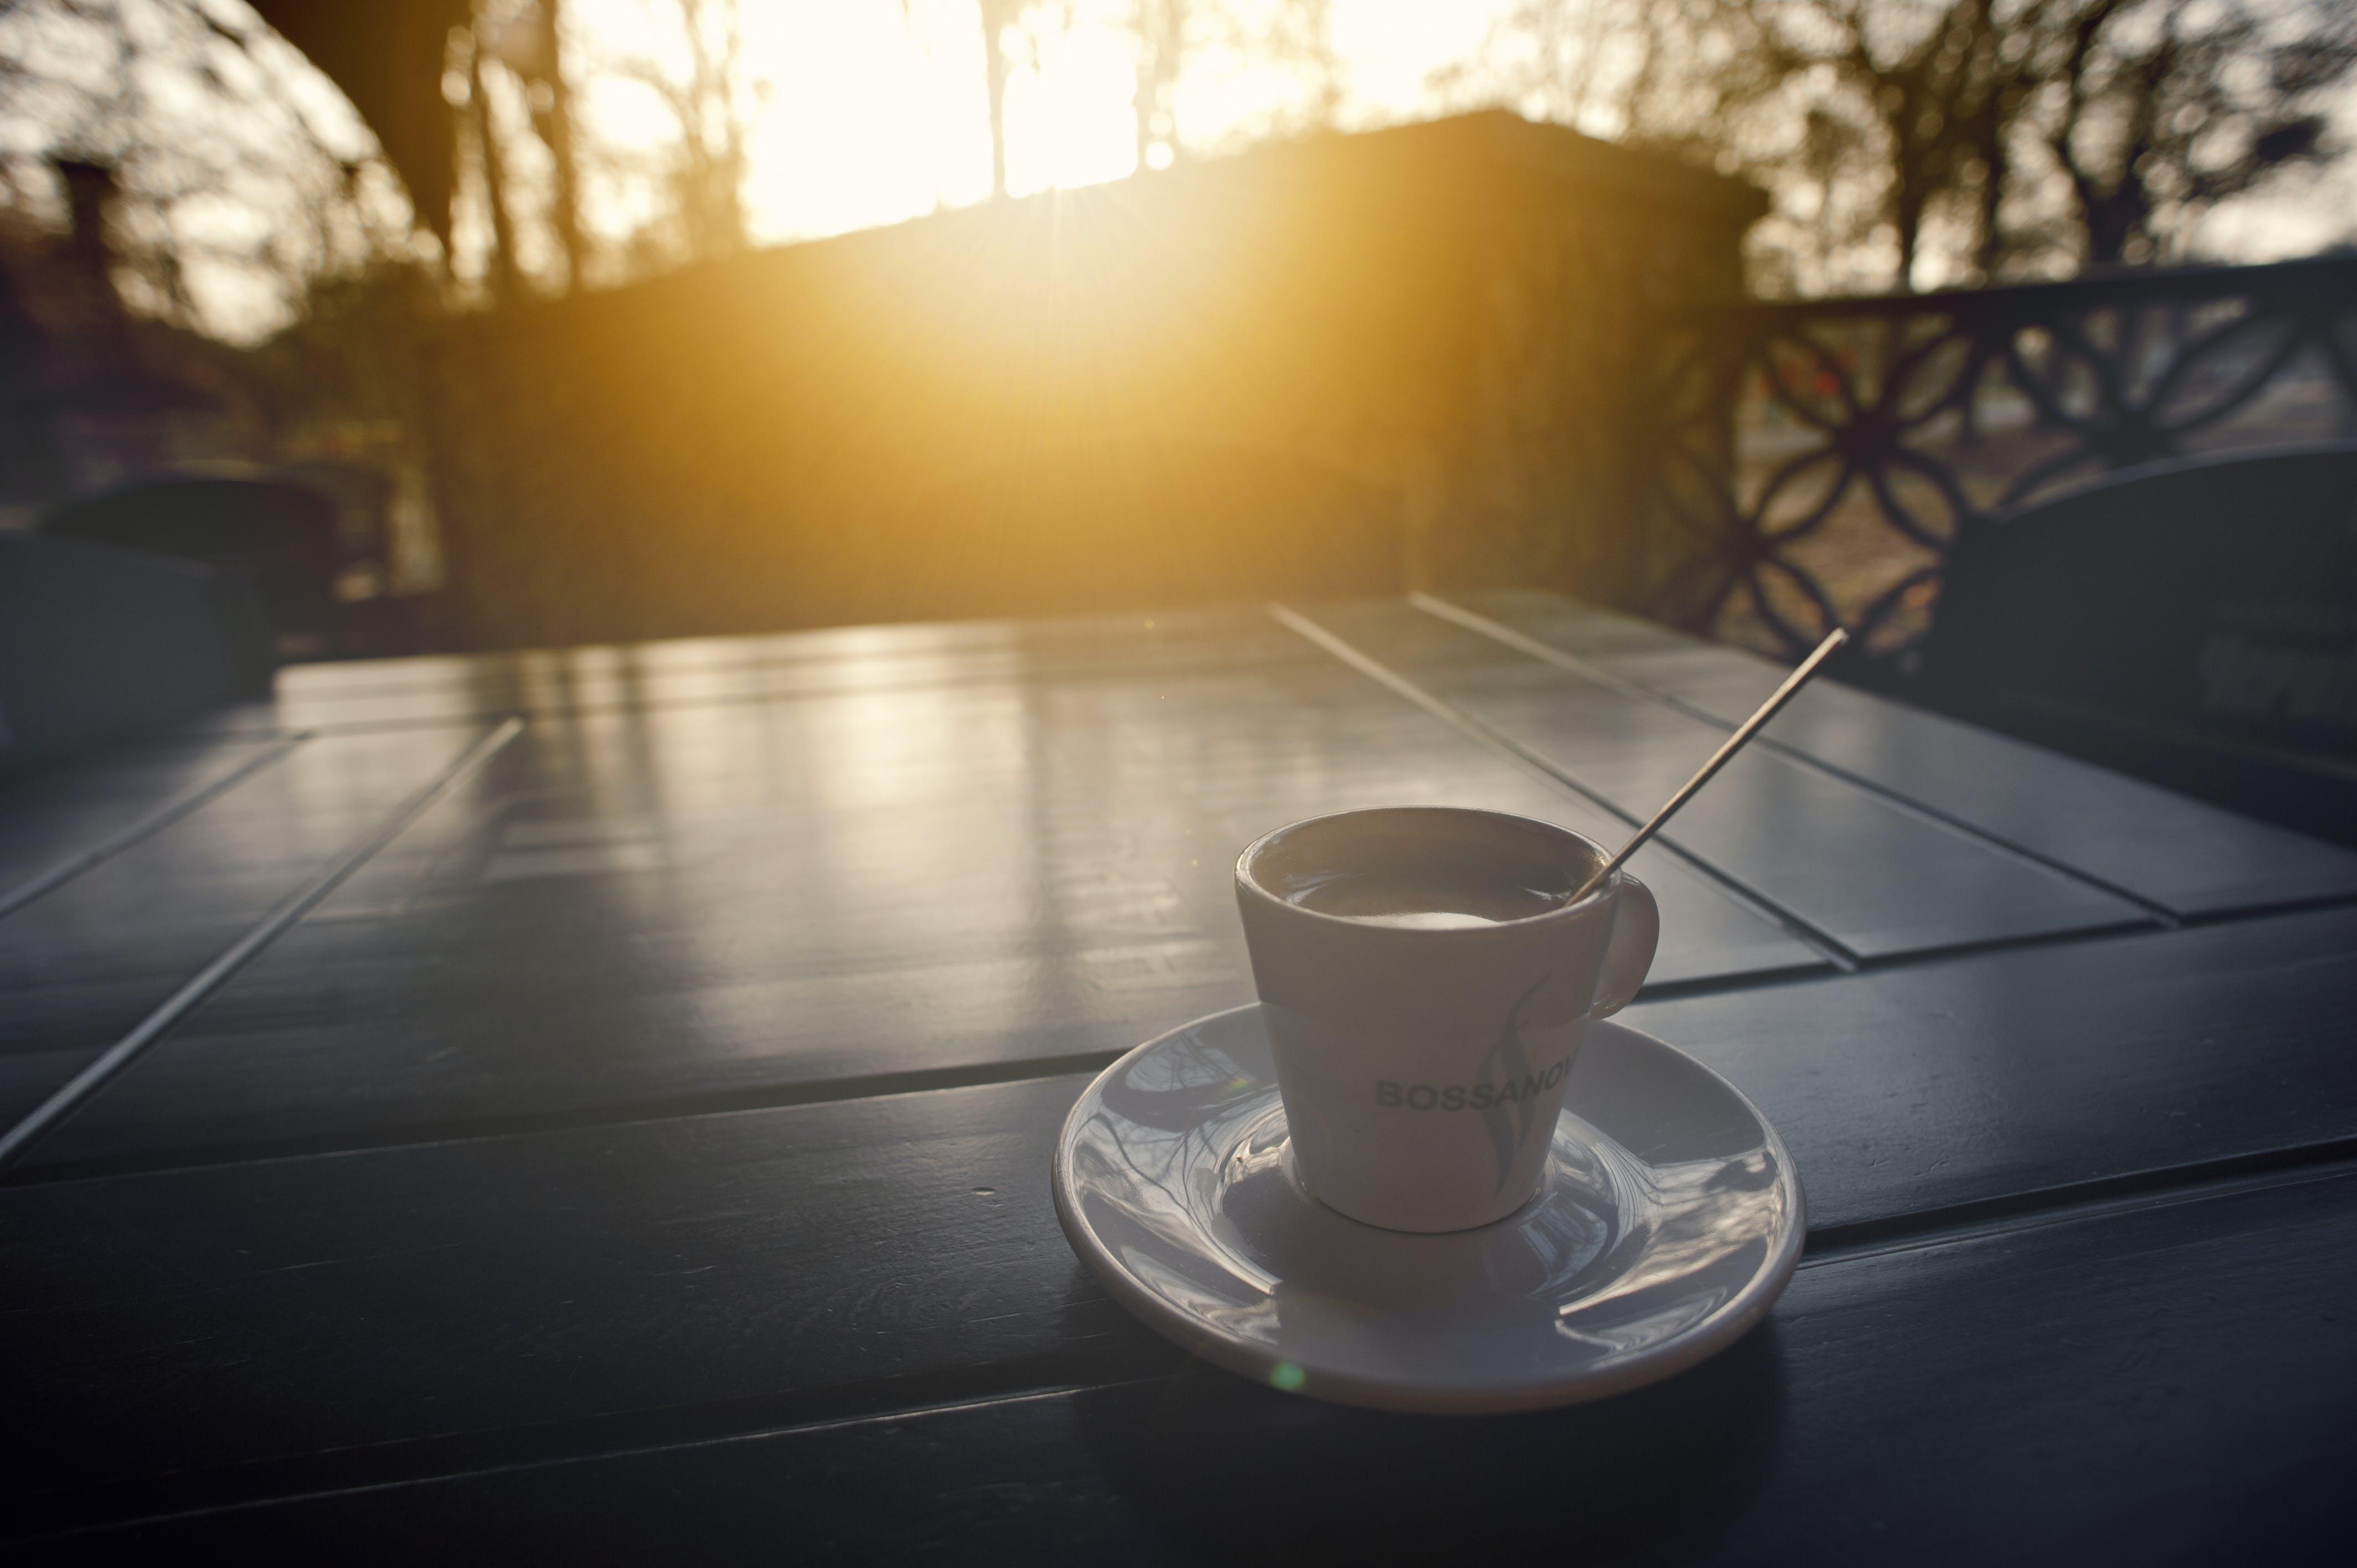 Kostenloses Stock Foto zu dämmerung, sonnenuntergang, koffein, kaffee